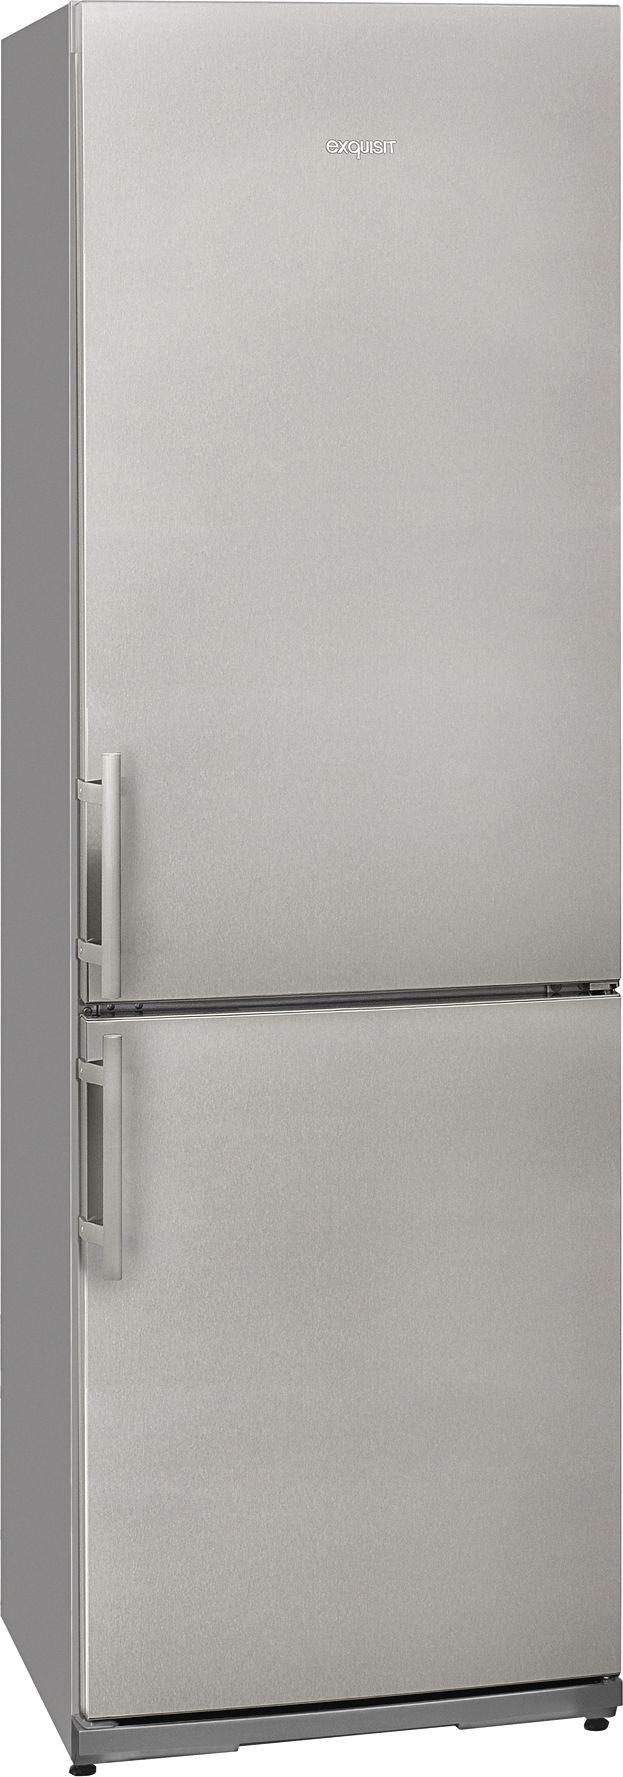 teamsix kgc 35 1a stg inox look exquisit gro ger te combinati frigo congelatore. Black Bedroom Furniture Sets. Home Design Ideas